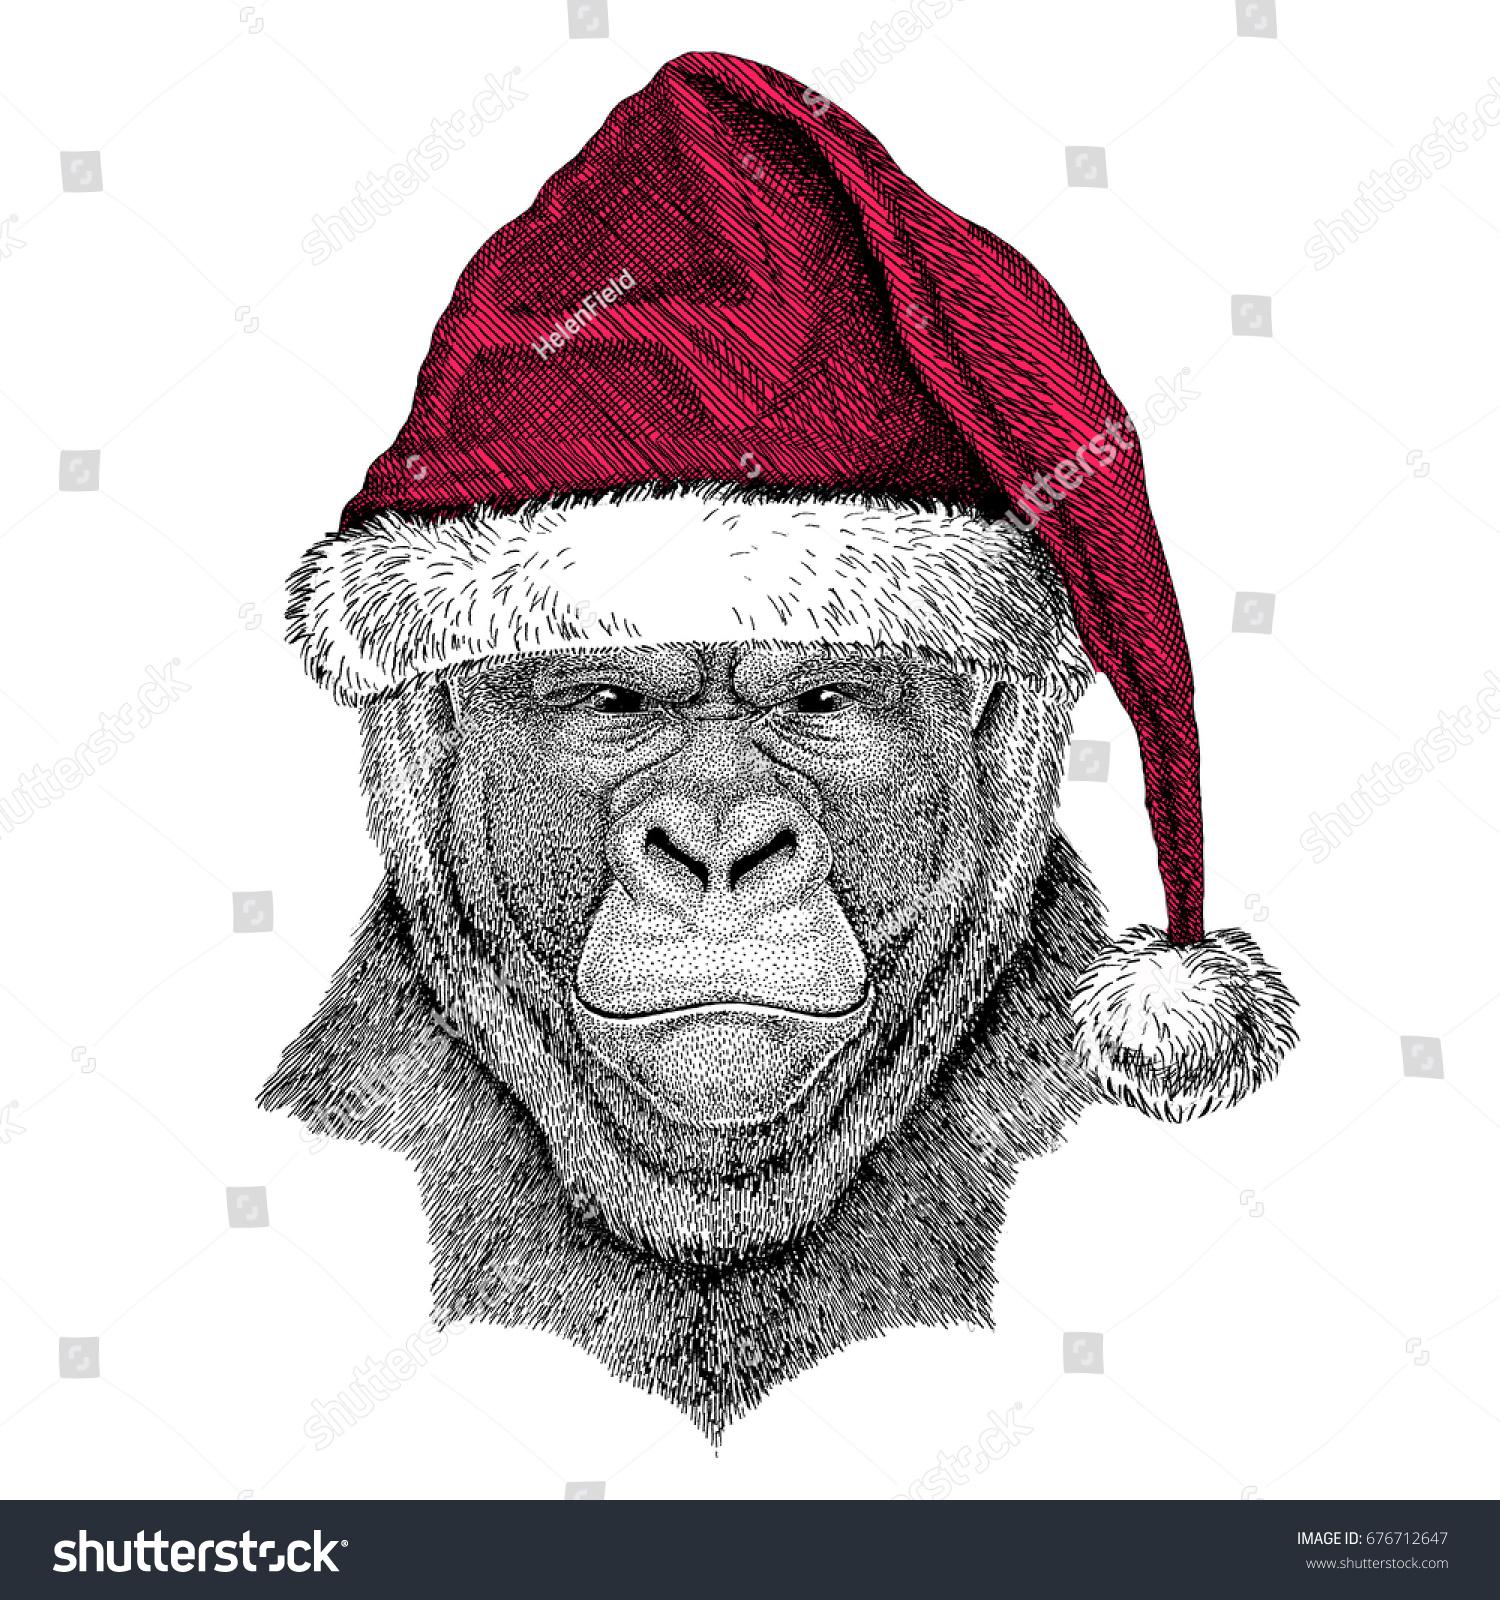 Gorilla Monkey Ape Frightful Animal Christmas Stock ...